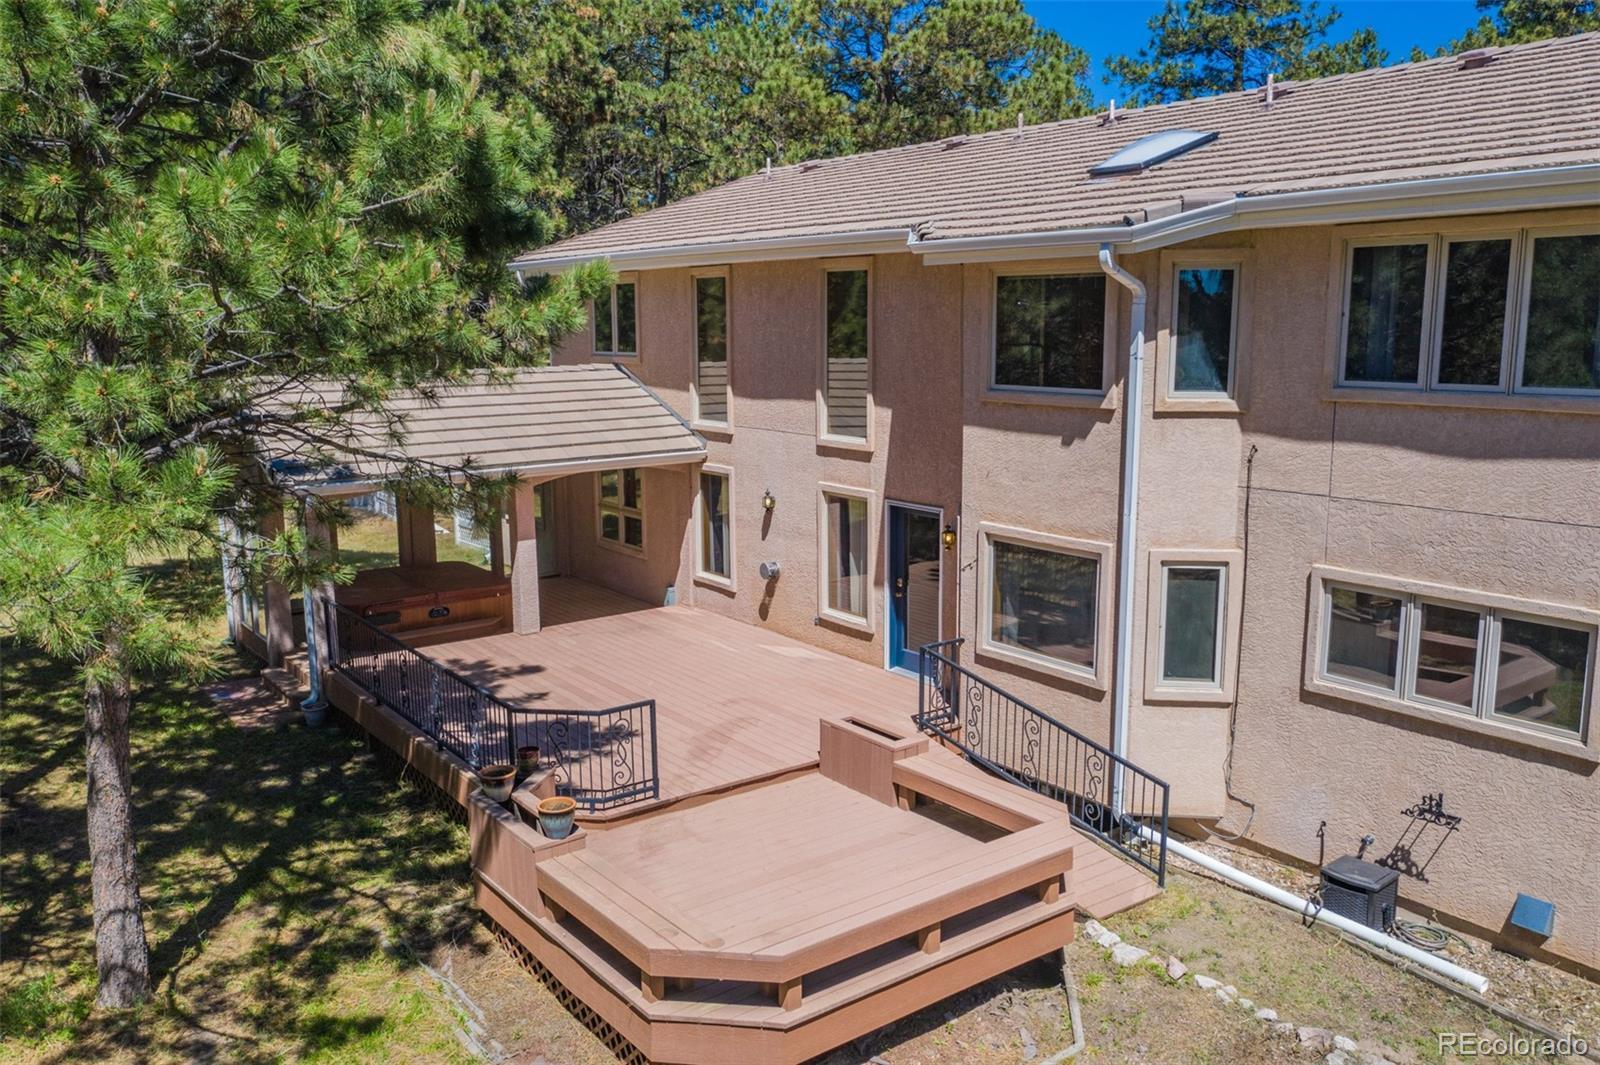 MLS# 2707350 - 39 - 17310 Charter Pines , Colorado Springs, CO 80132